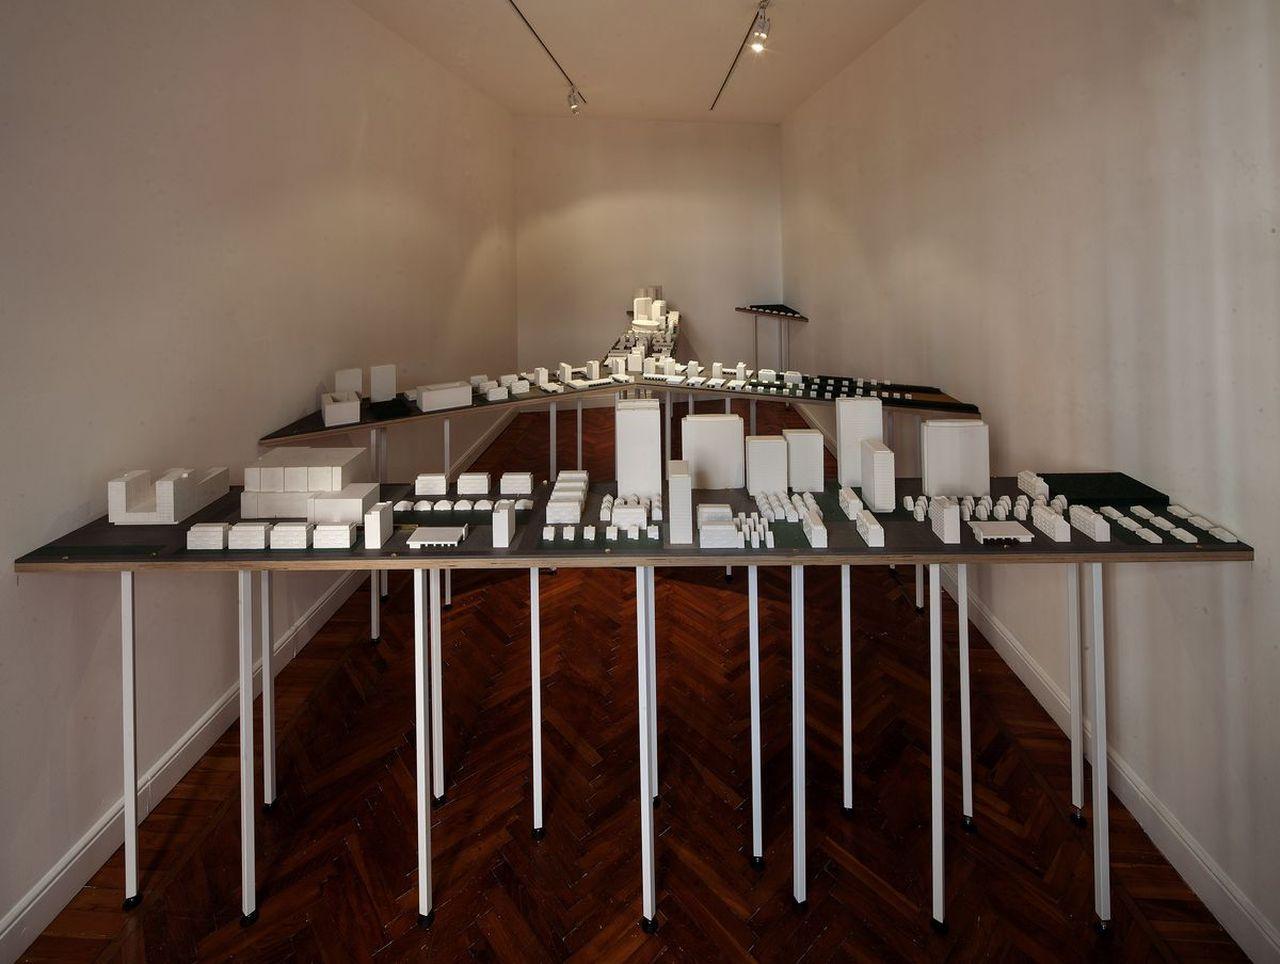 Gallery of Venice Biennale 2012: Futura Bold? Post-City